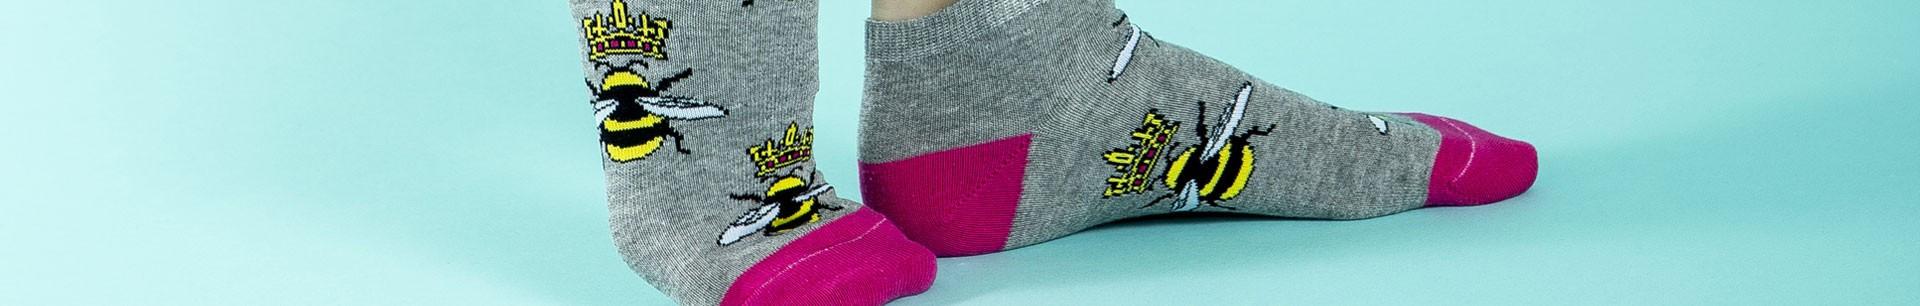 Women's Trainer Socks | Ladies' Trainer Liner